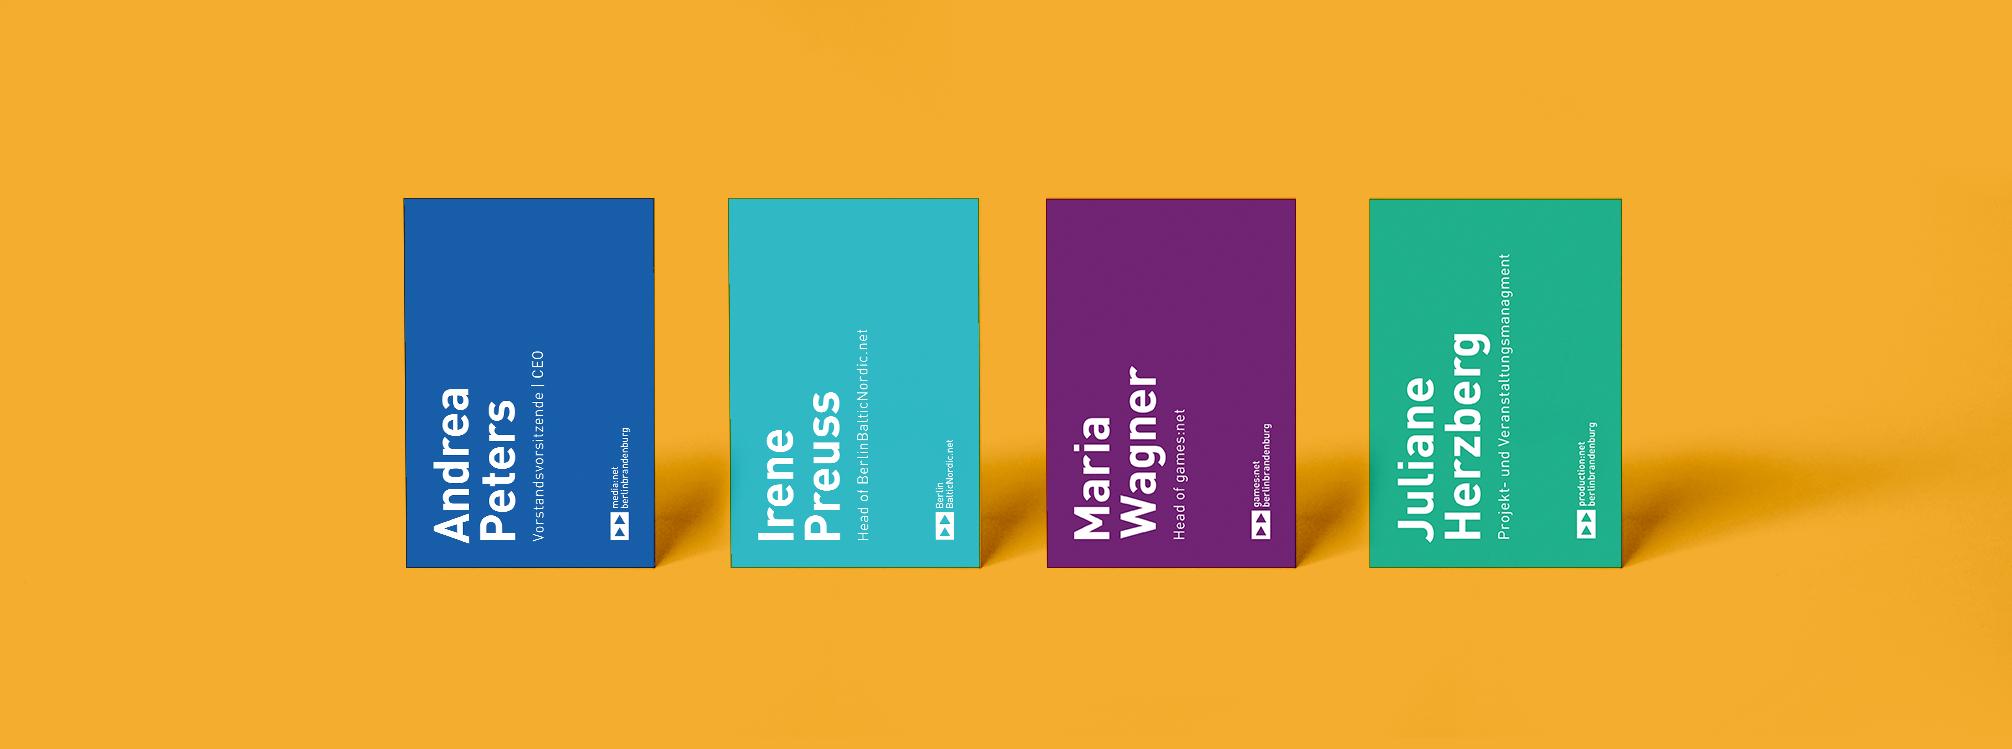 Visitenkarten Redesign - Corporate Design media net berlinbrandenburg und Initiativen